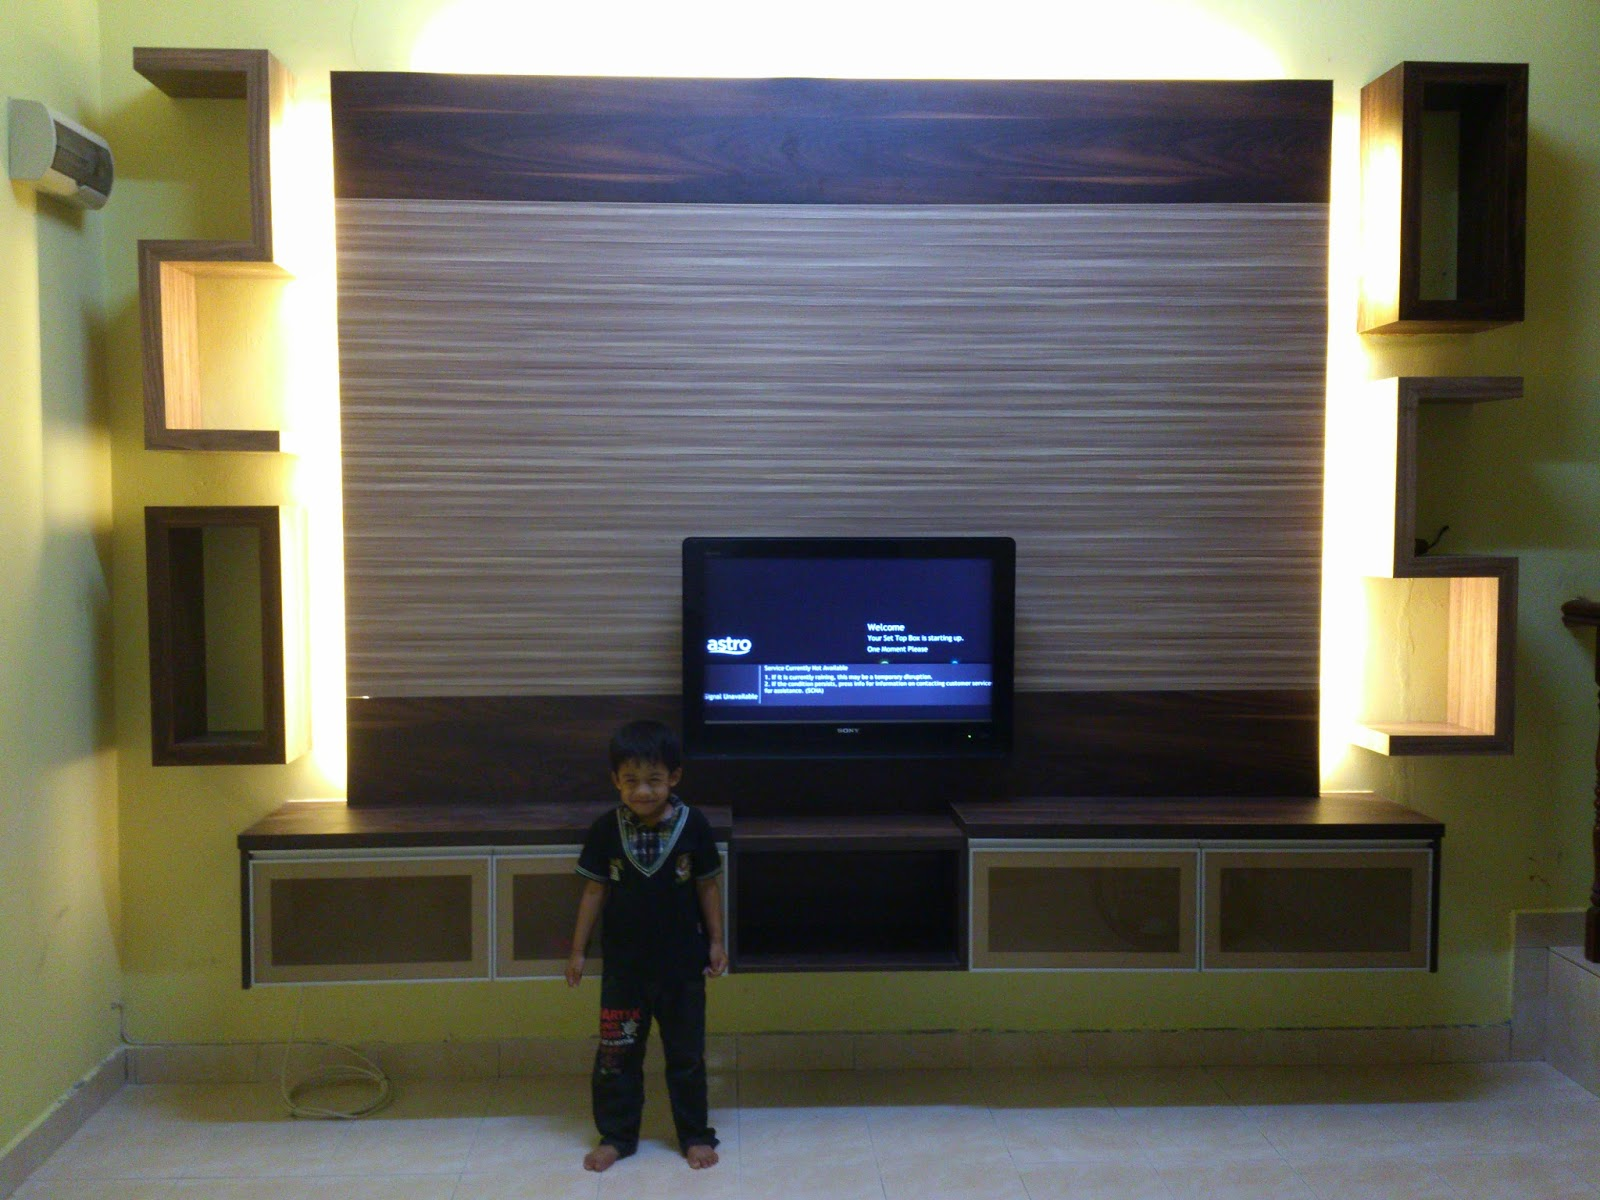 Tv Cabinet Yang Tergantung Mengekalkan Keluasan Rumah